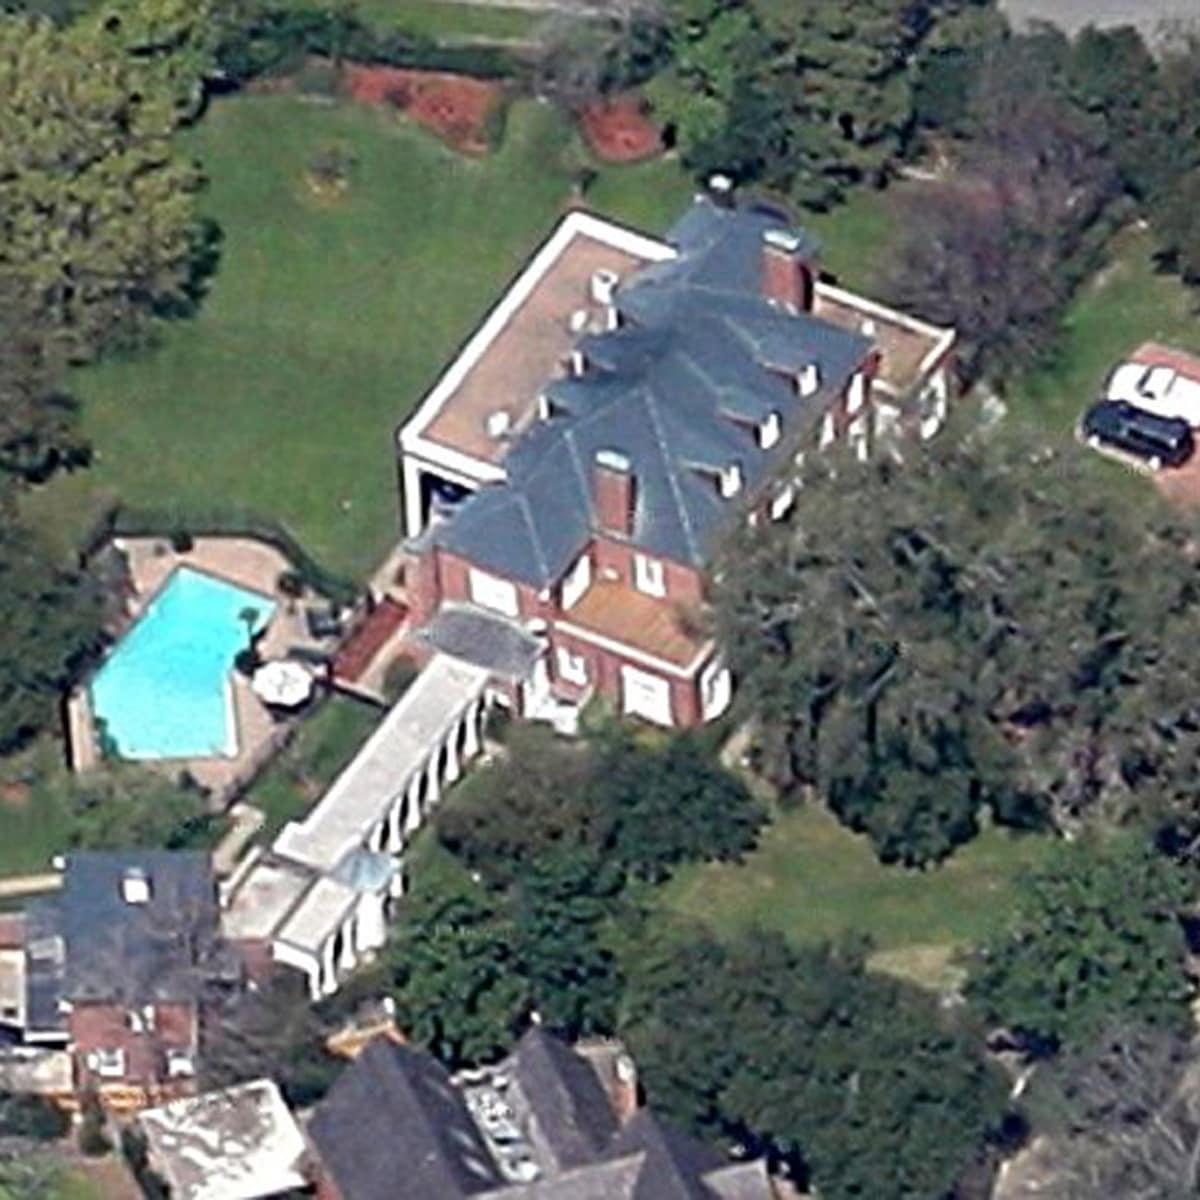 Fayez Sarofim to marry Susan Krohn January 2014 River Oaks home aerial